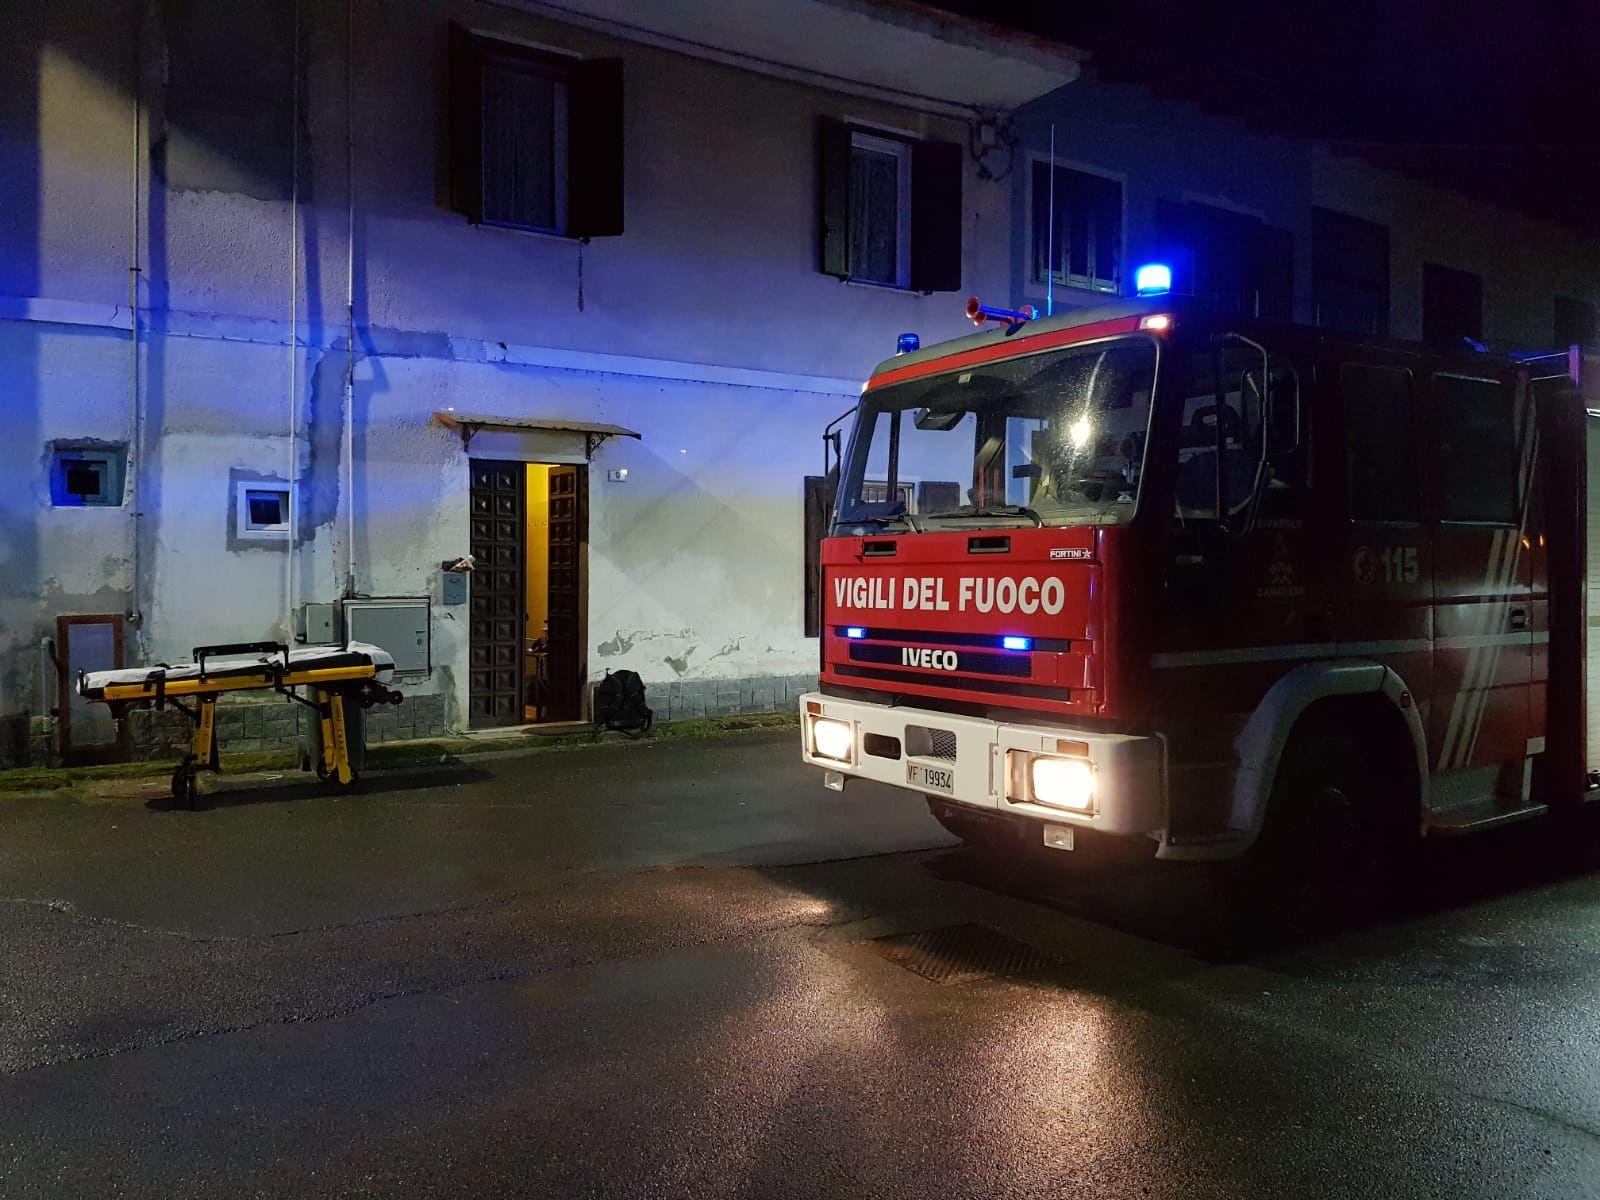 BOSCONERO - Cade in casa, soccorso dai vigili del fuoco - VIDEO